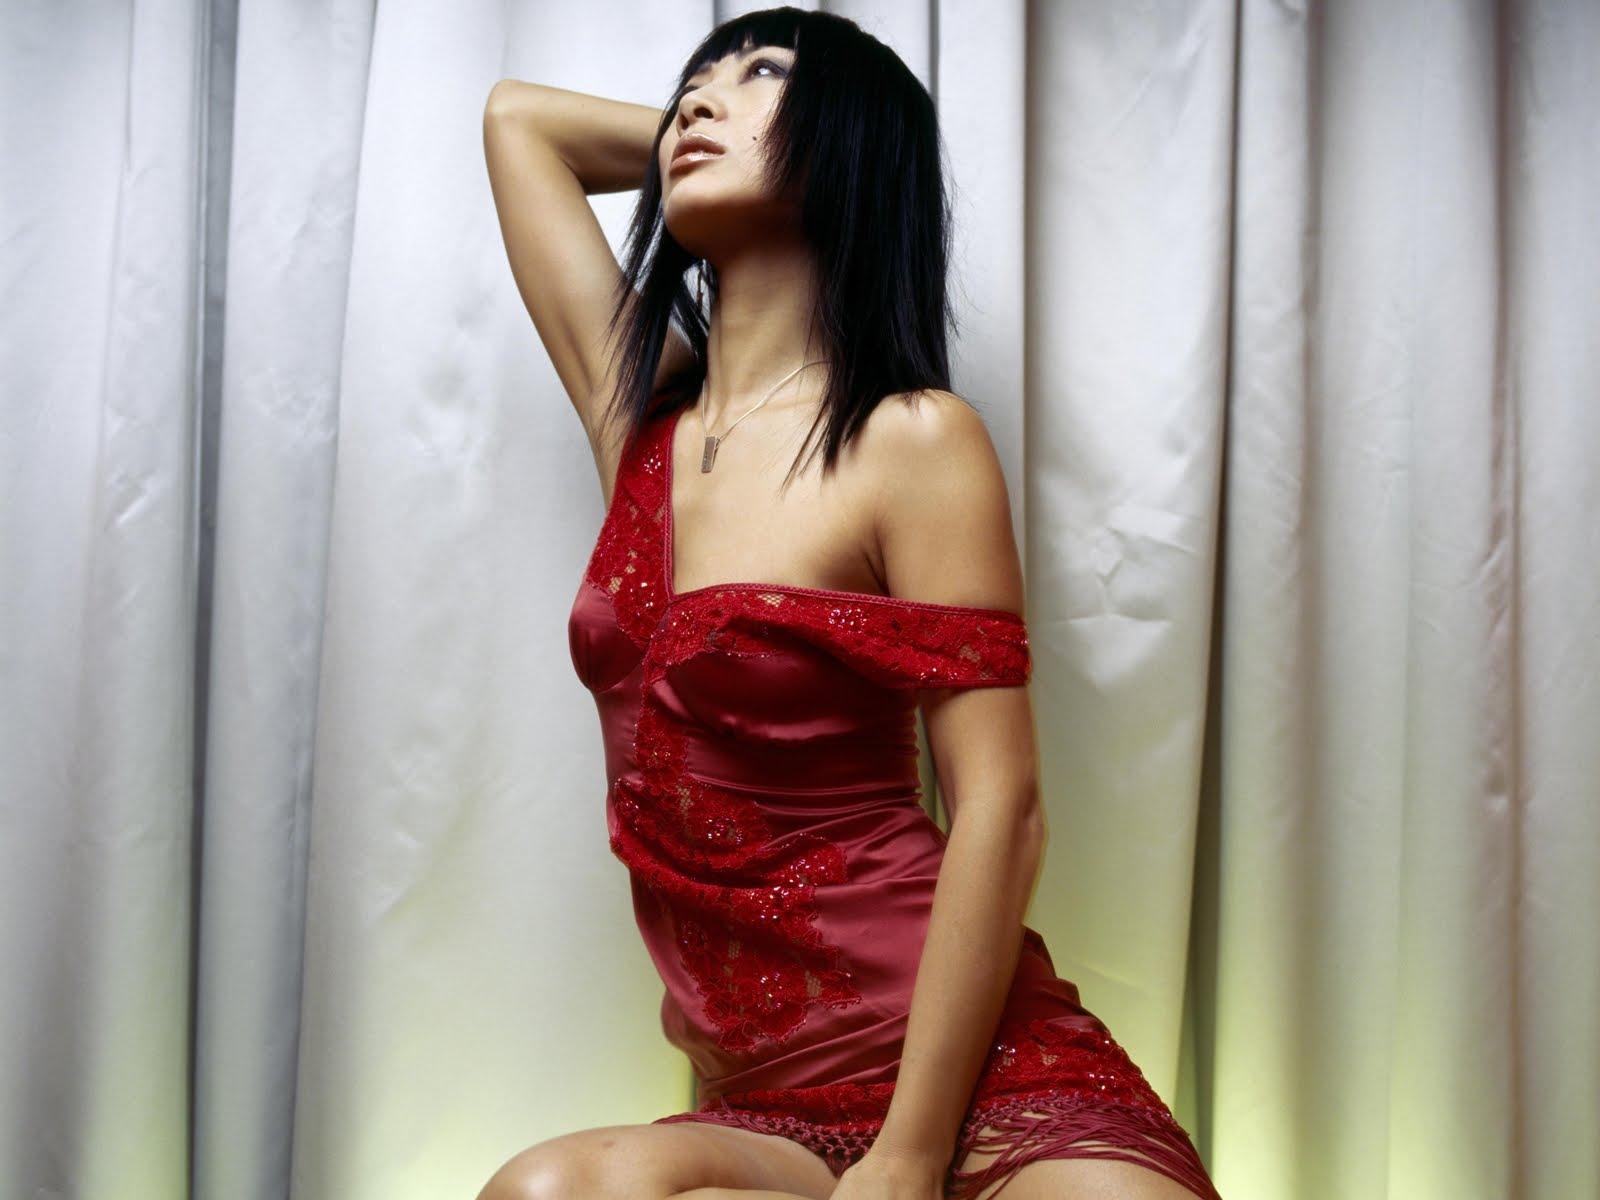 http://4.bp.blogspot.com/-ngtVcfF3pas/TYMxlT-RdkI/AAAAAAAAHdQ/PMorpsXgQ6s/s1600/celebskin_bai_ling_cleavage_wallpaper.jpg